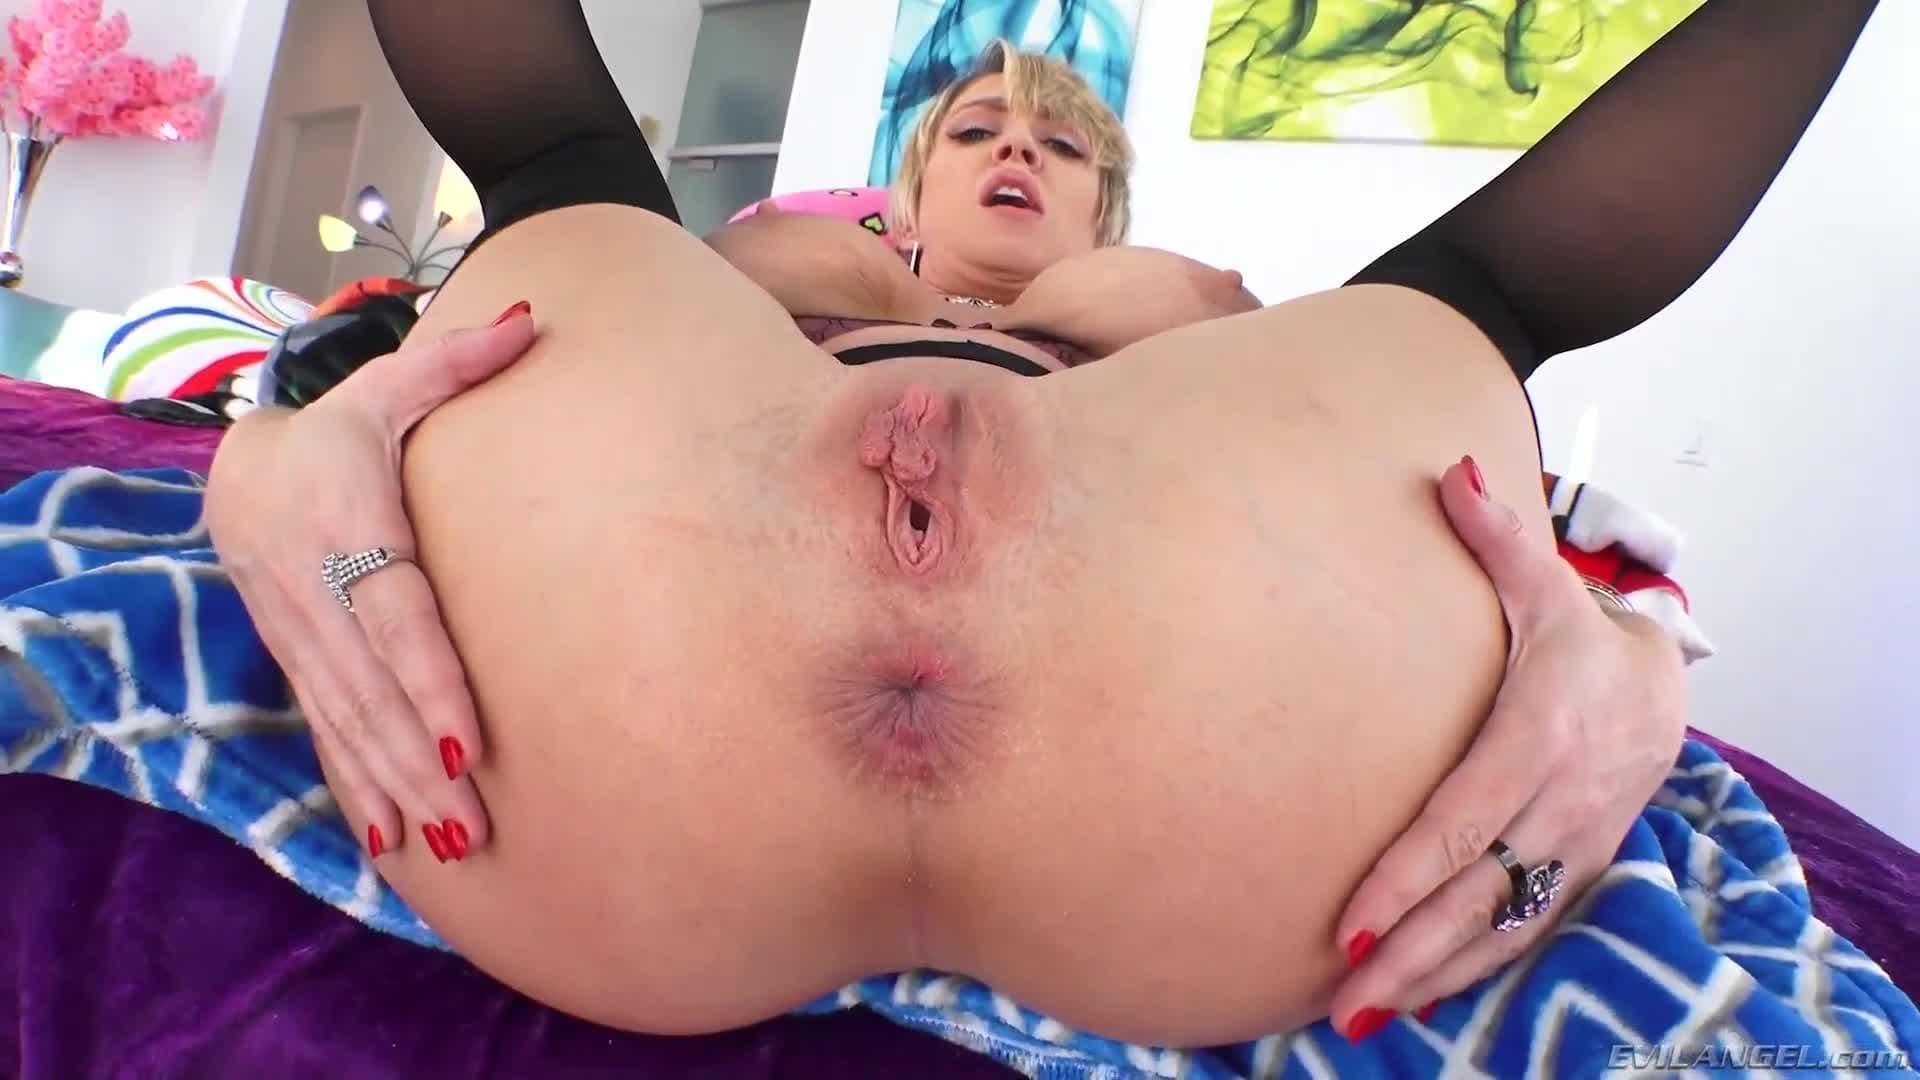 Brandi belle anal sexe